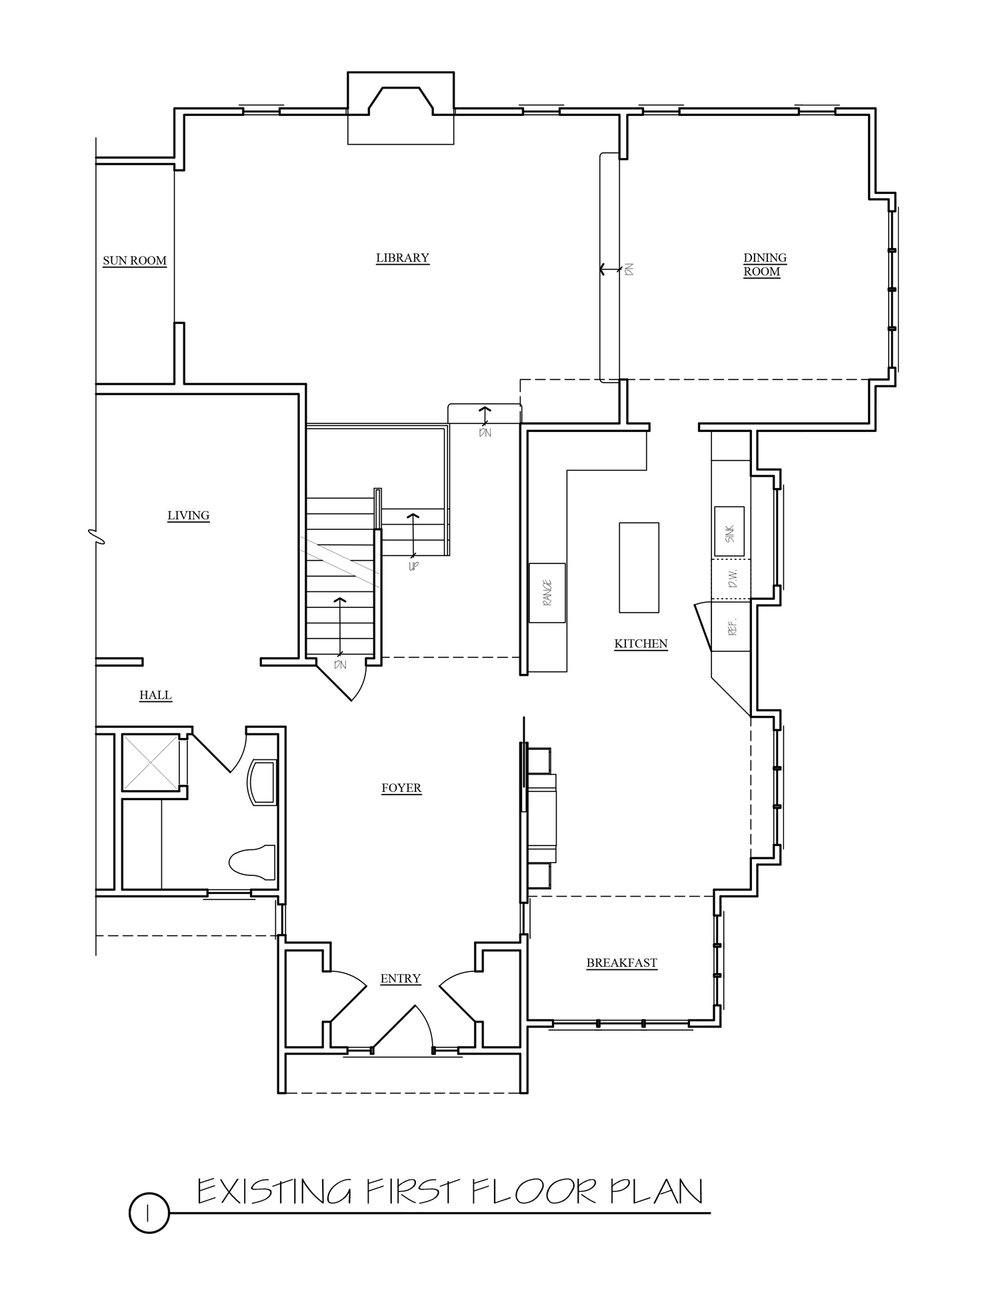 4_Existing-First-Floor-Plan.jpg